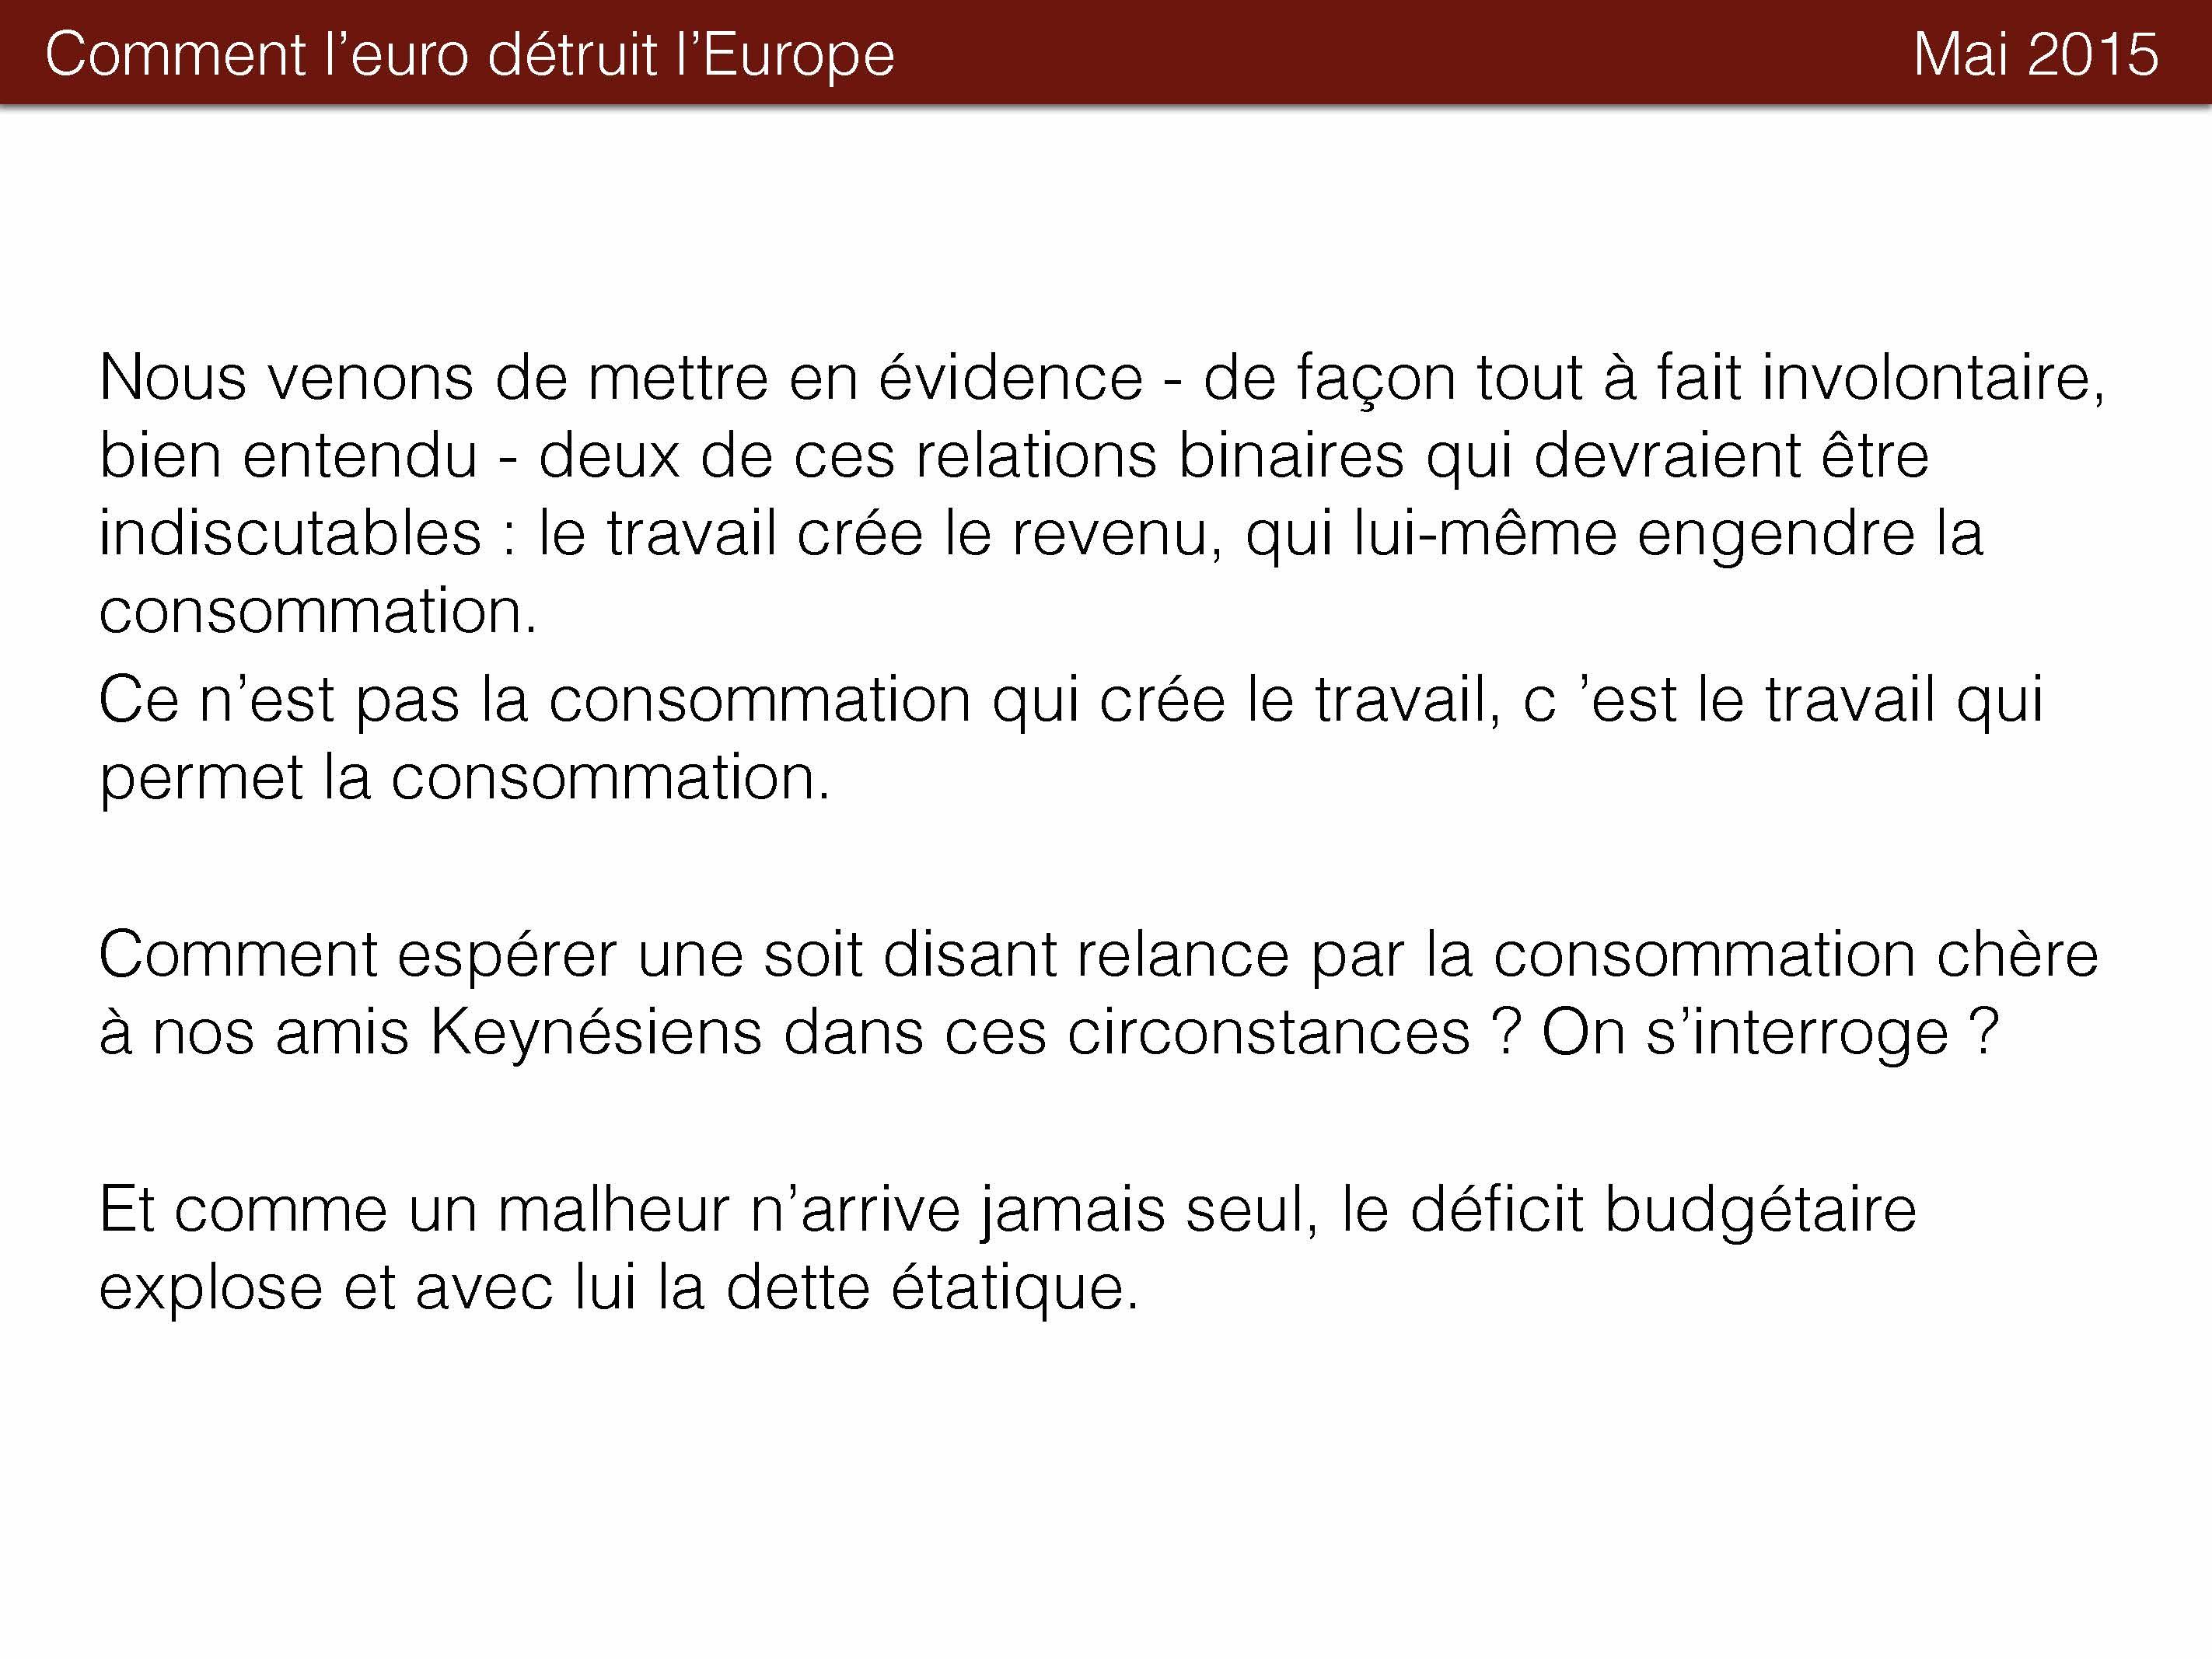 EUro_Page_24